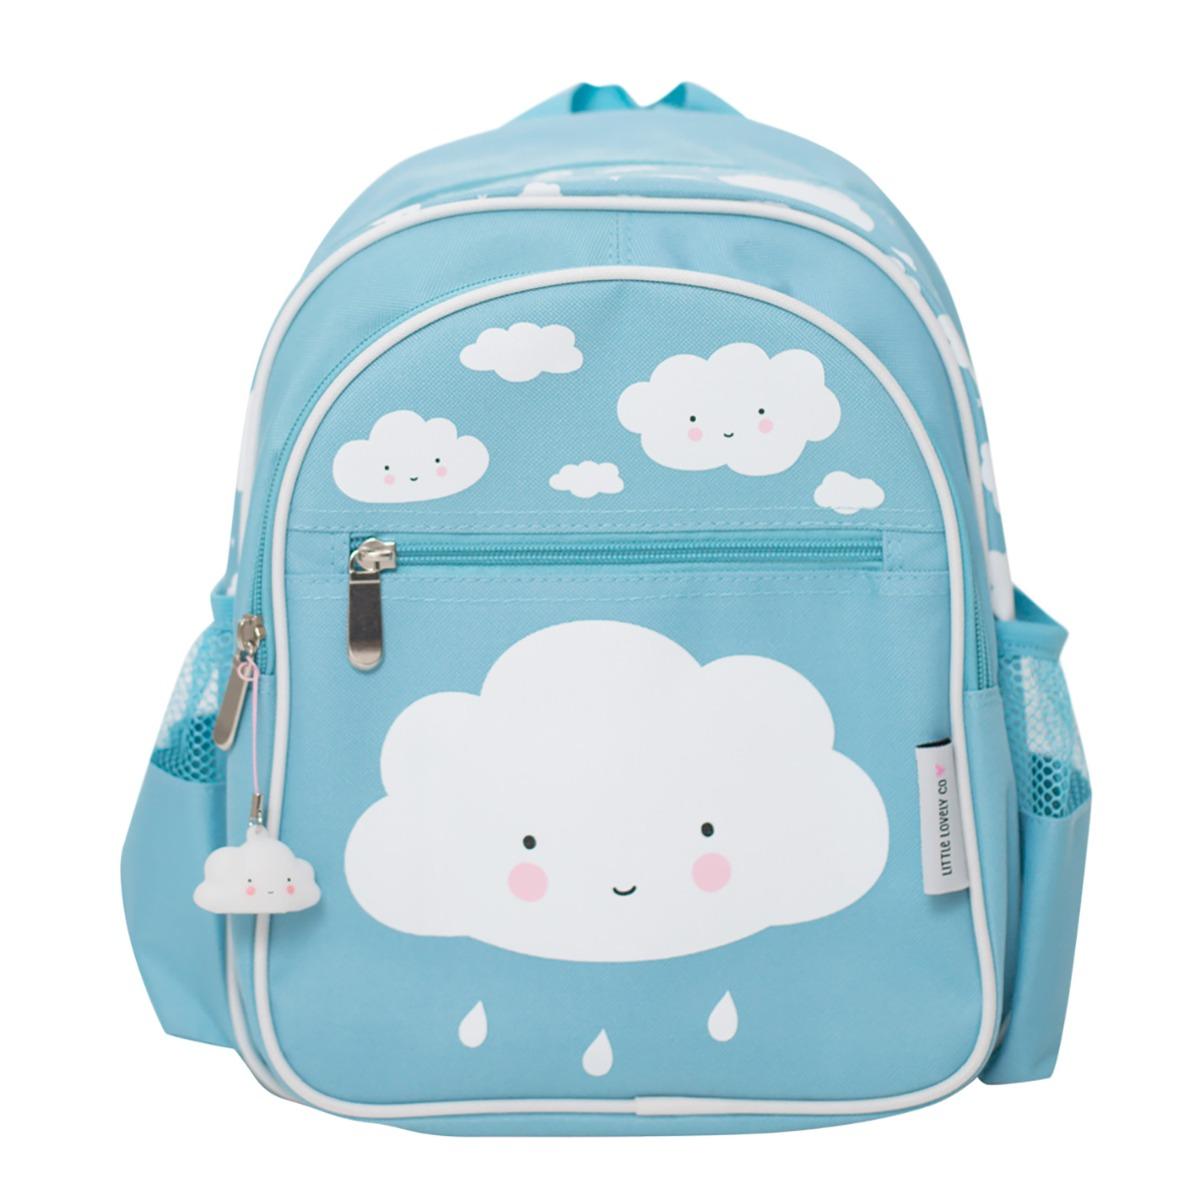 Backpack-Blue Cloud